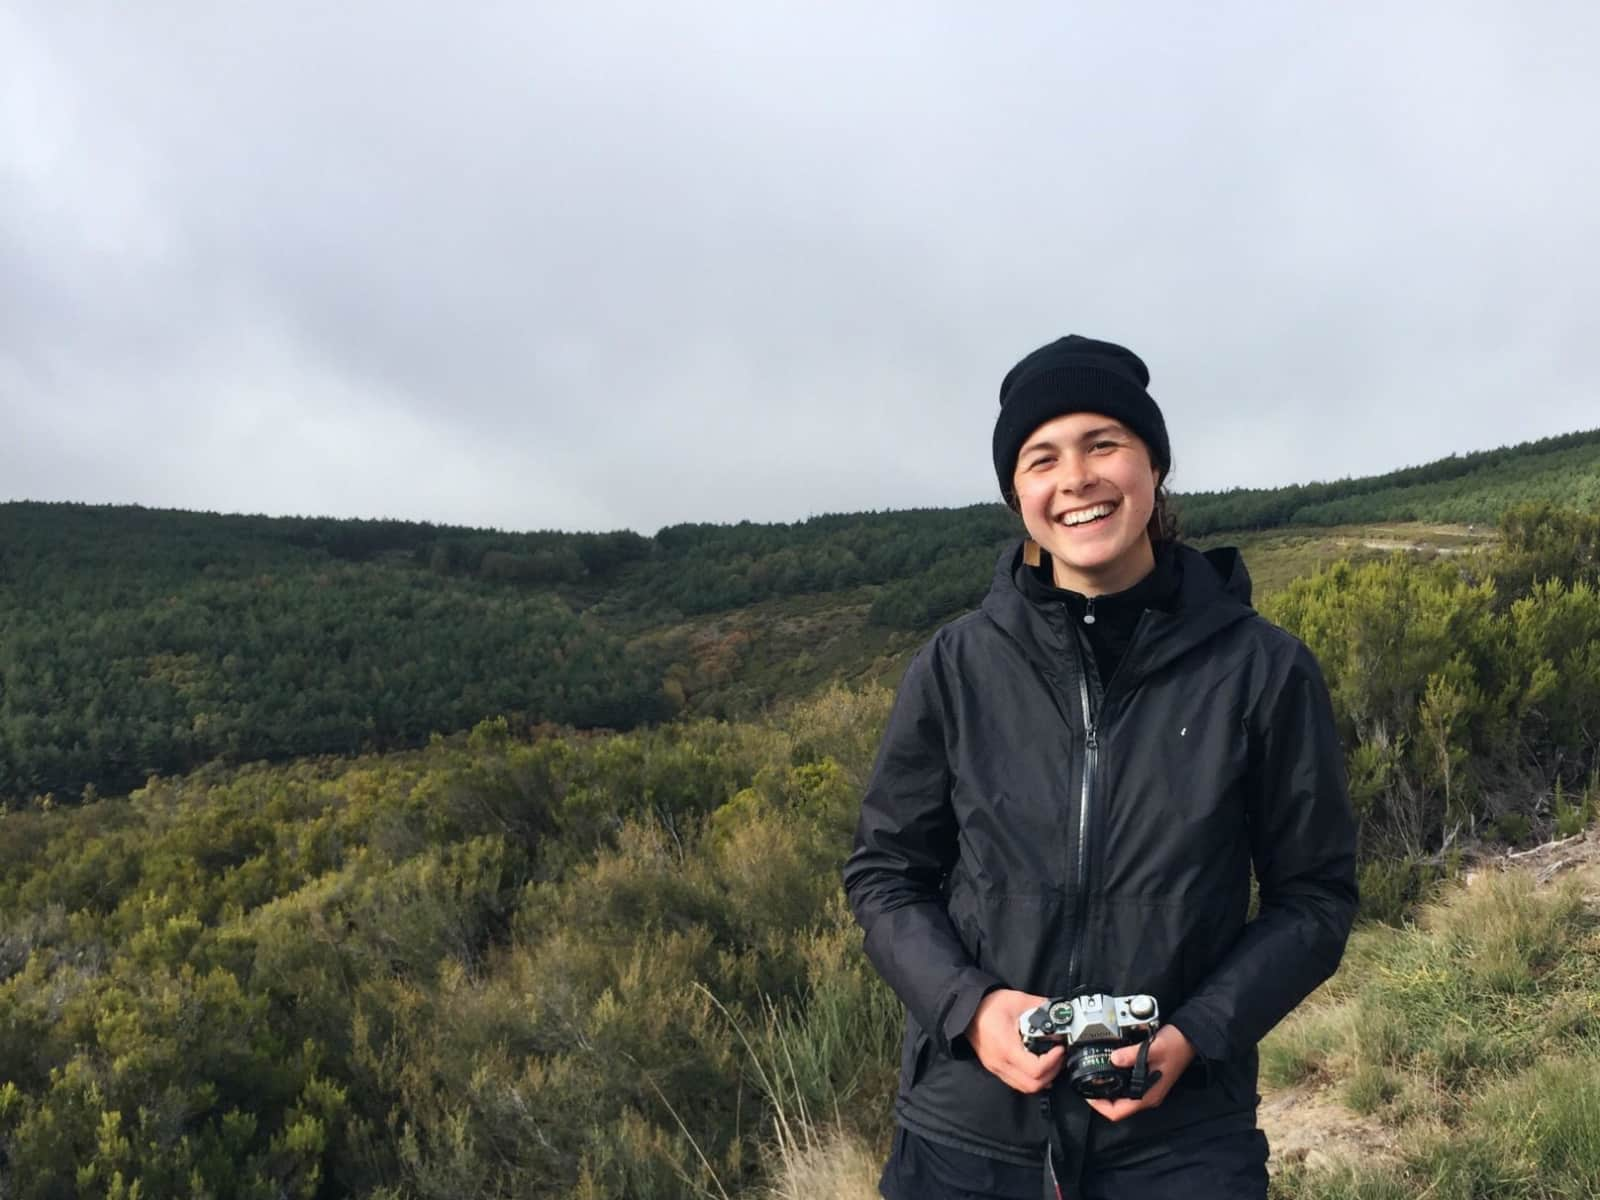 Jacinta from Melbourne, Victoria, Australia